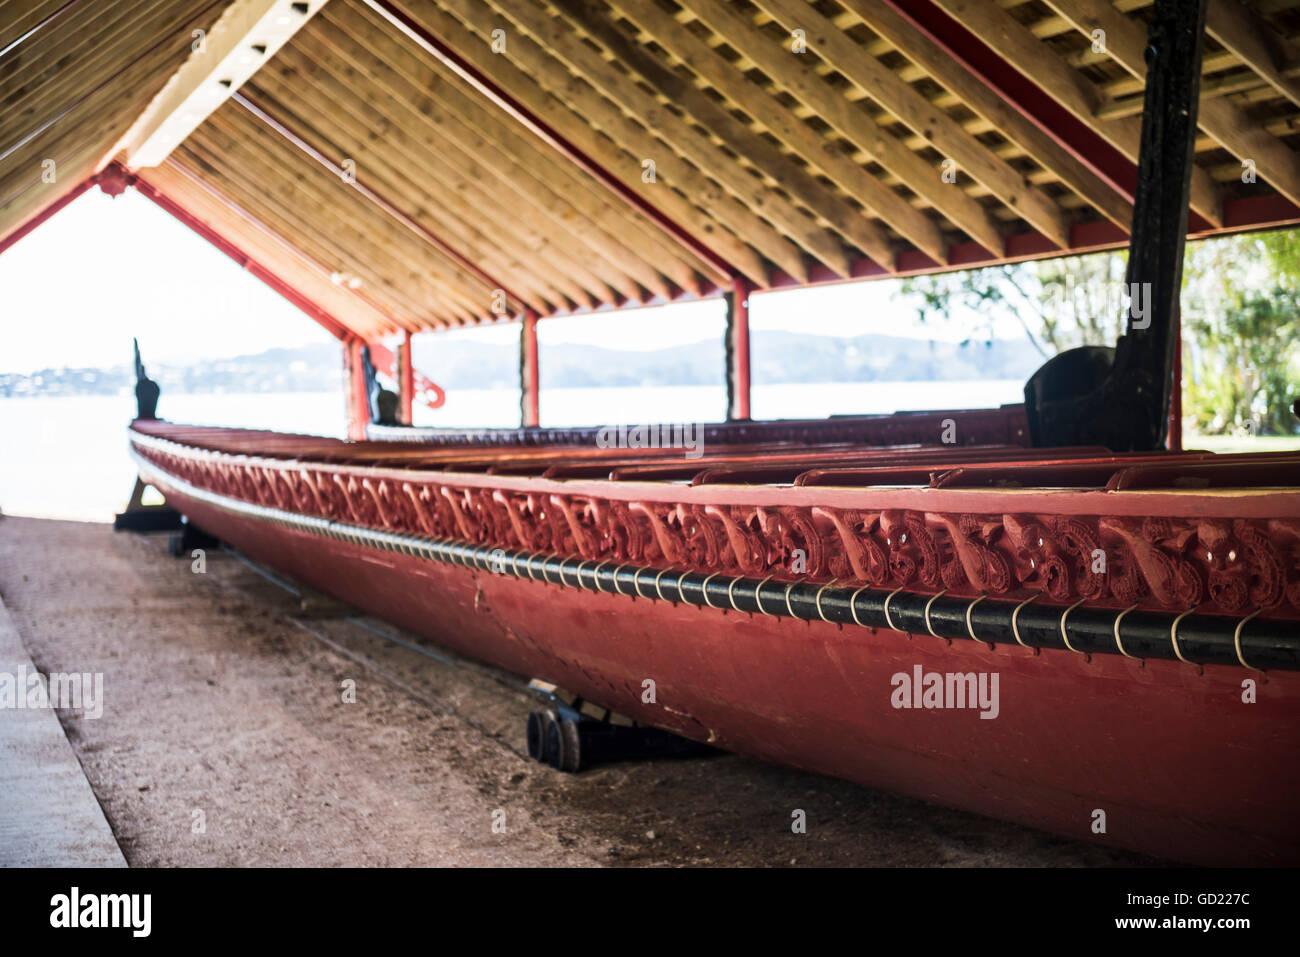 Maori boat, Waitangi Treaty Grounds, Bay of Islands, Northland Region, North Island, New Zealand, Pacific - Stock Image